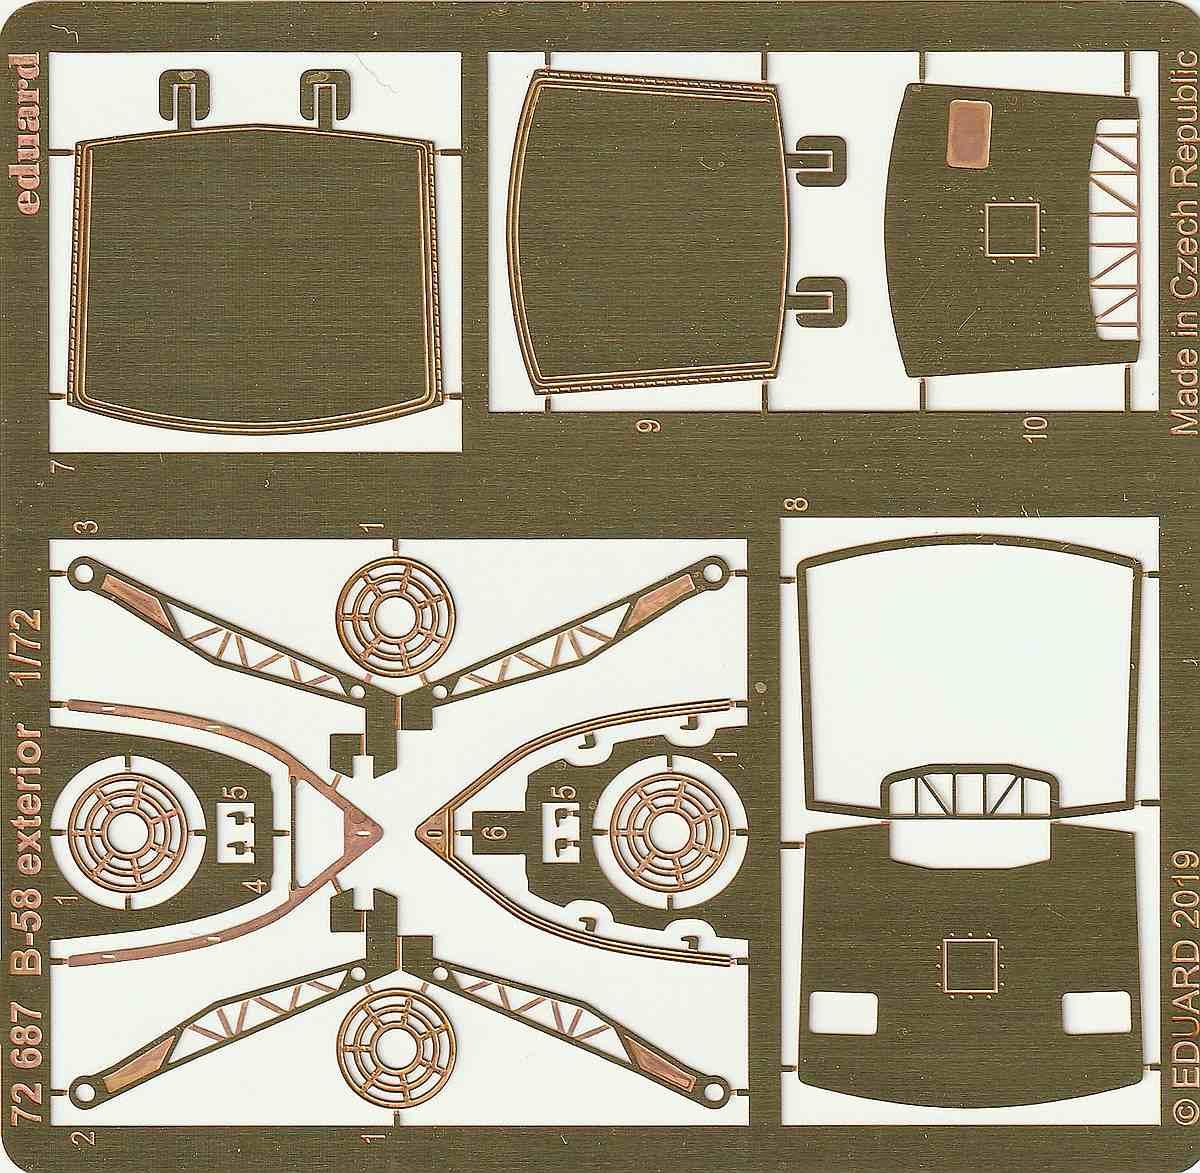 Eduard-72687-B-58-Exterior-2 Eduard-Detailsets für die B-58 von Italeri